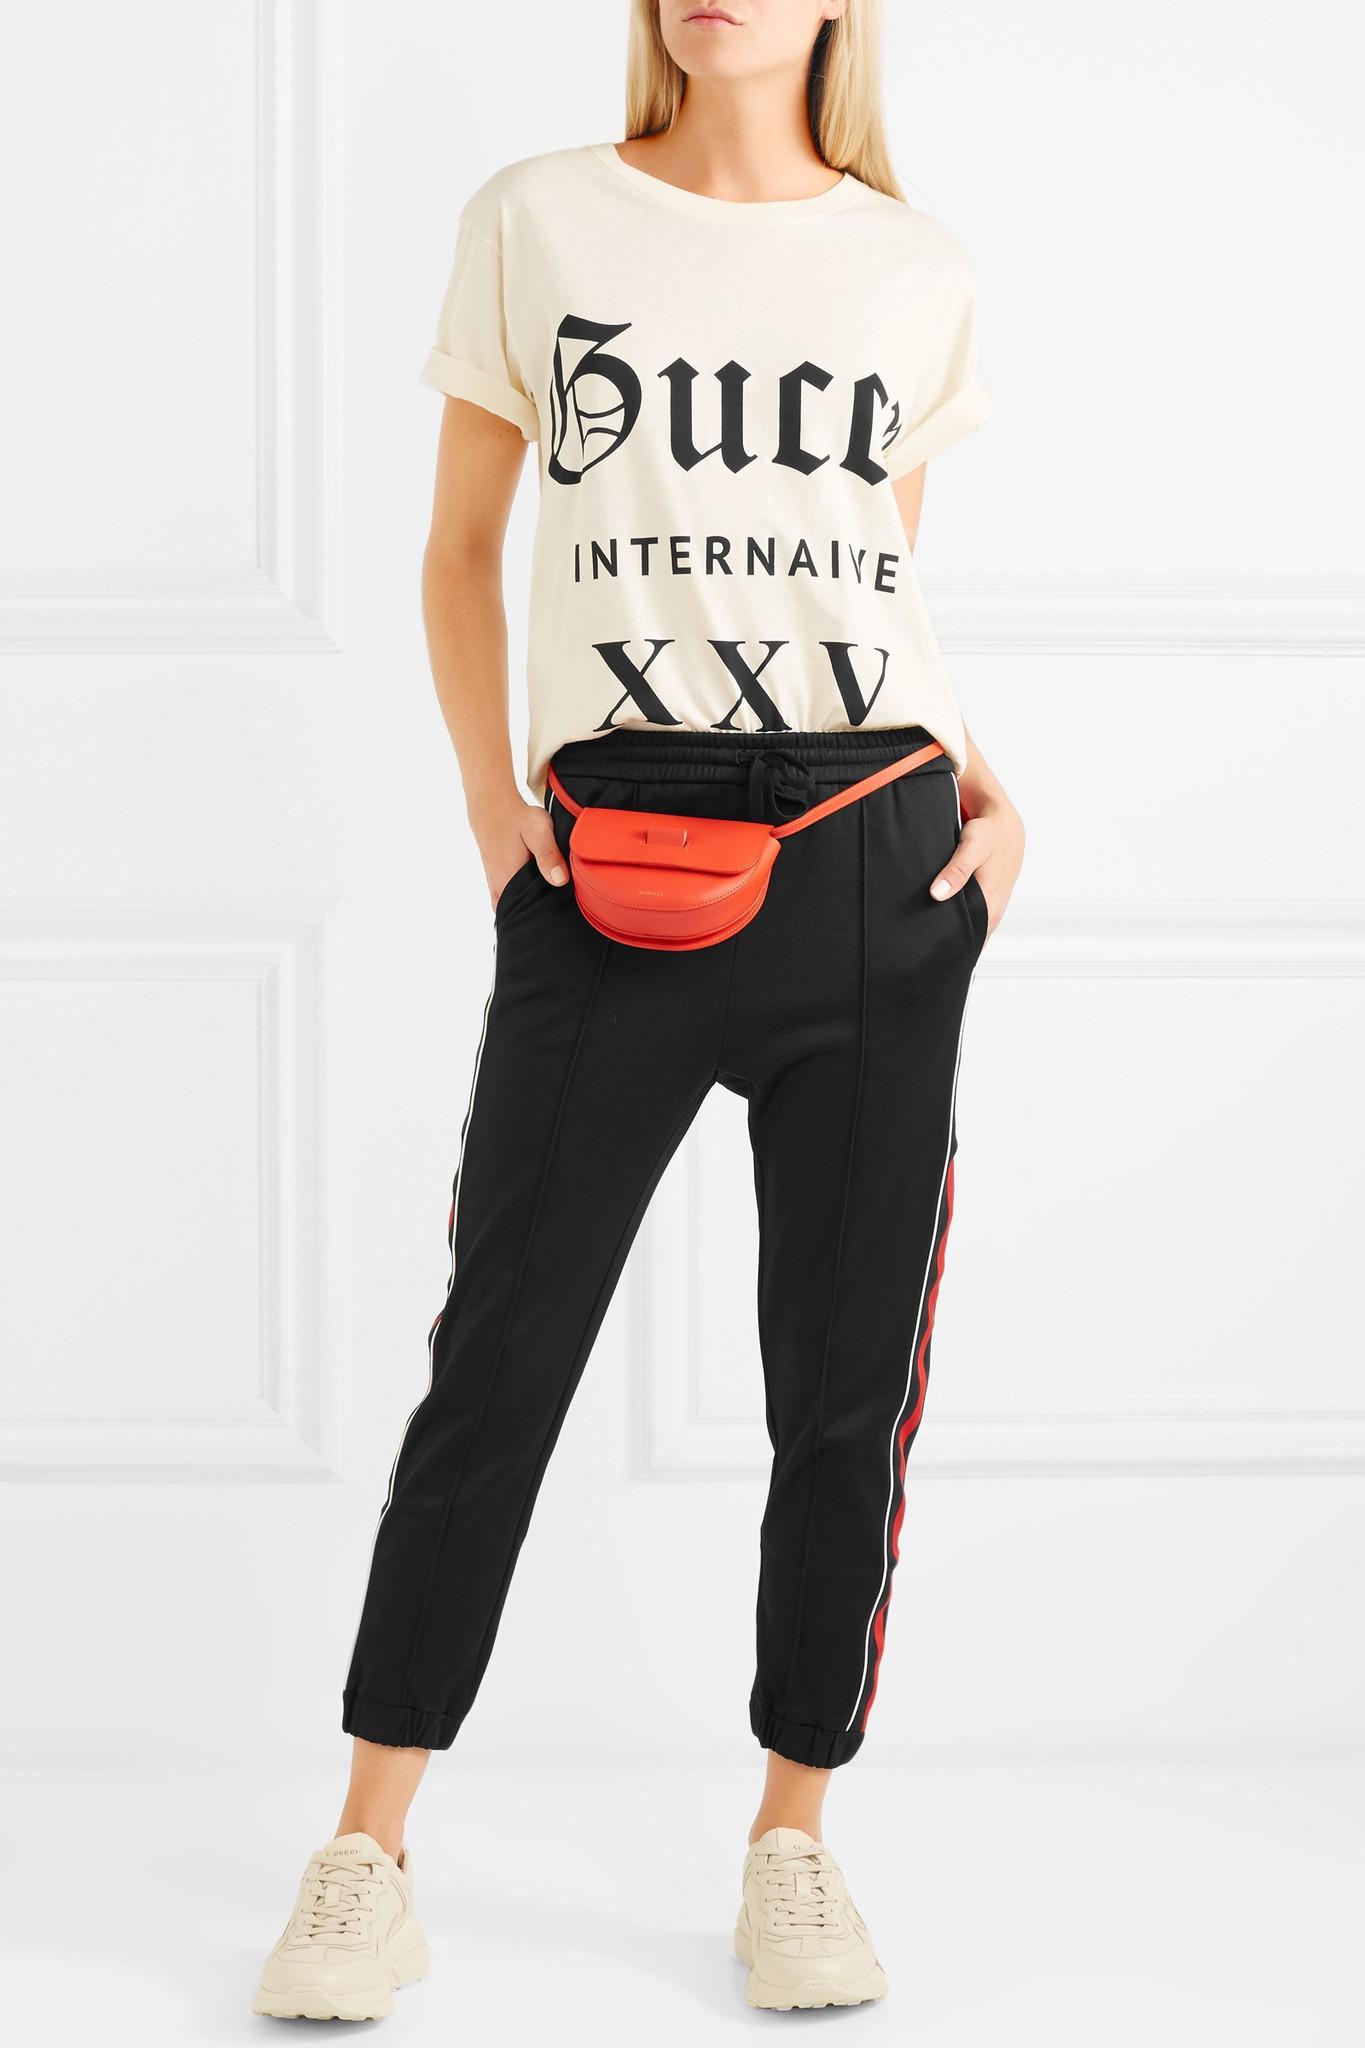 37b5d9489e37 Gucci - Black Striped Jersey Track Pants - Lyst. View fullscreen